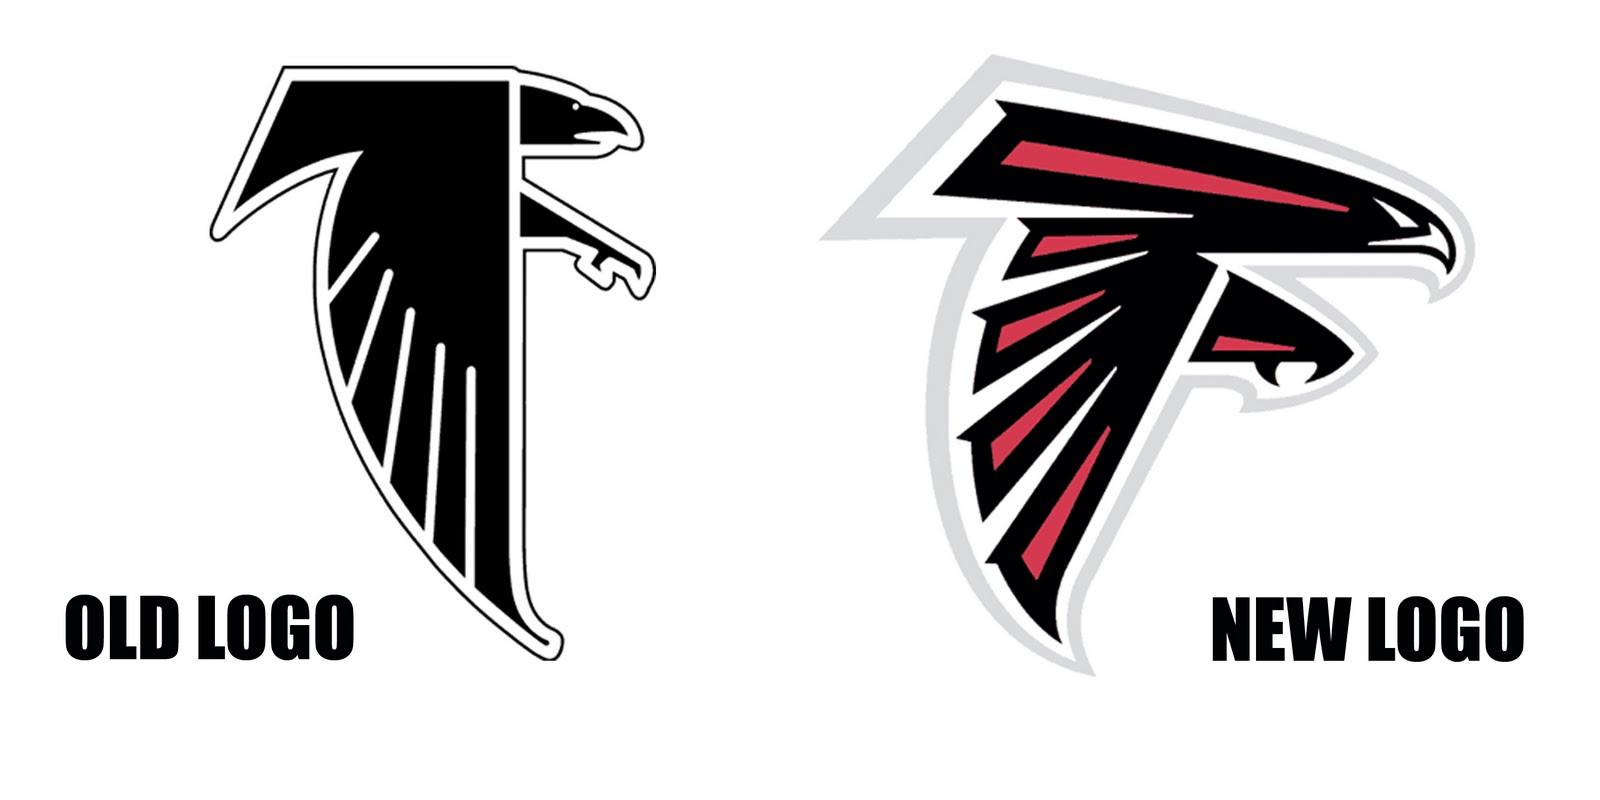 Images Of The Atlanta Falcons Football Logos: The Look